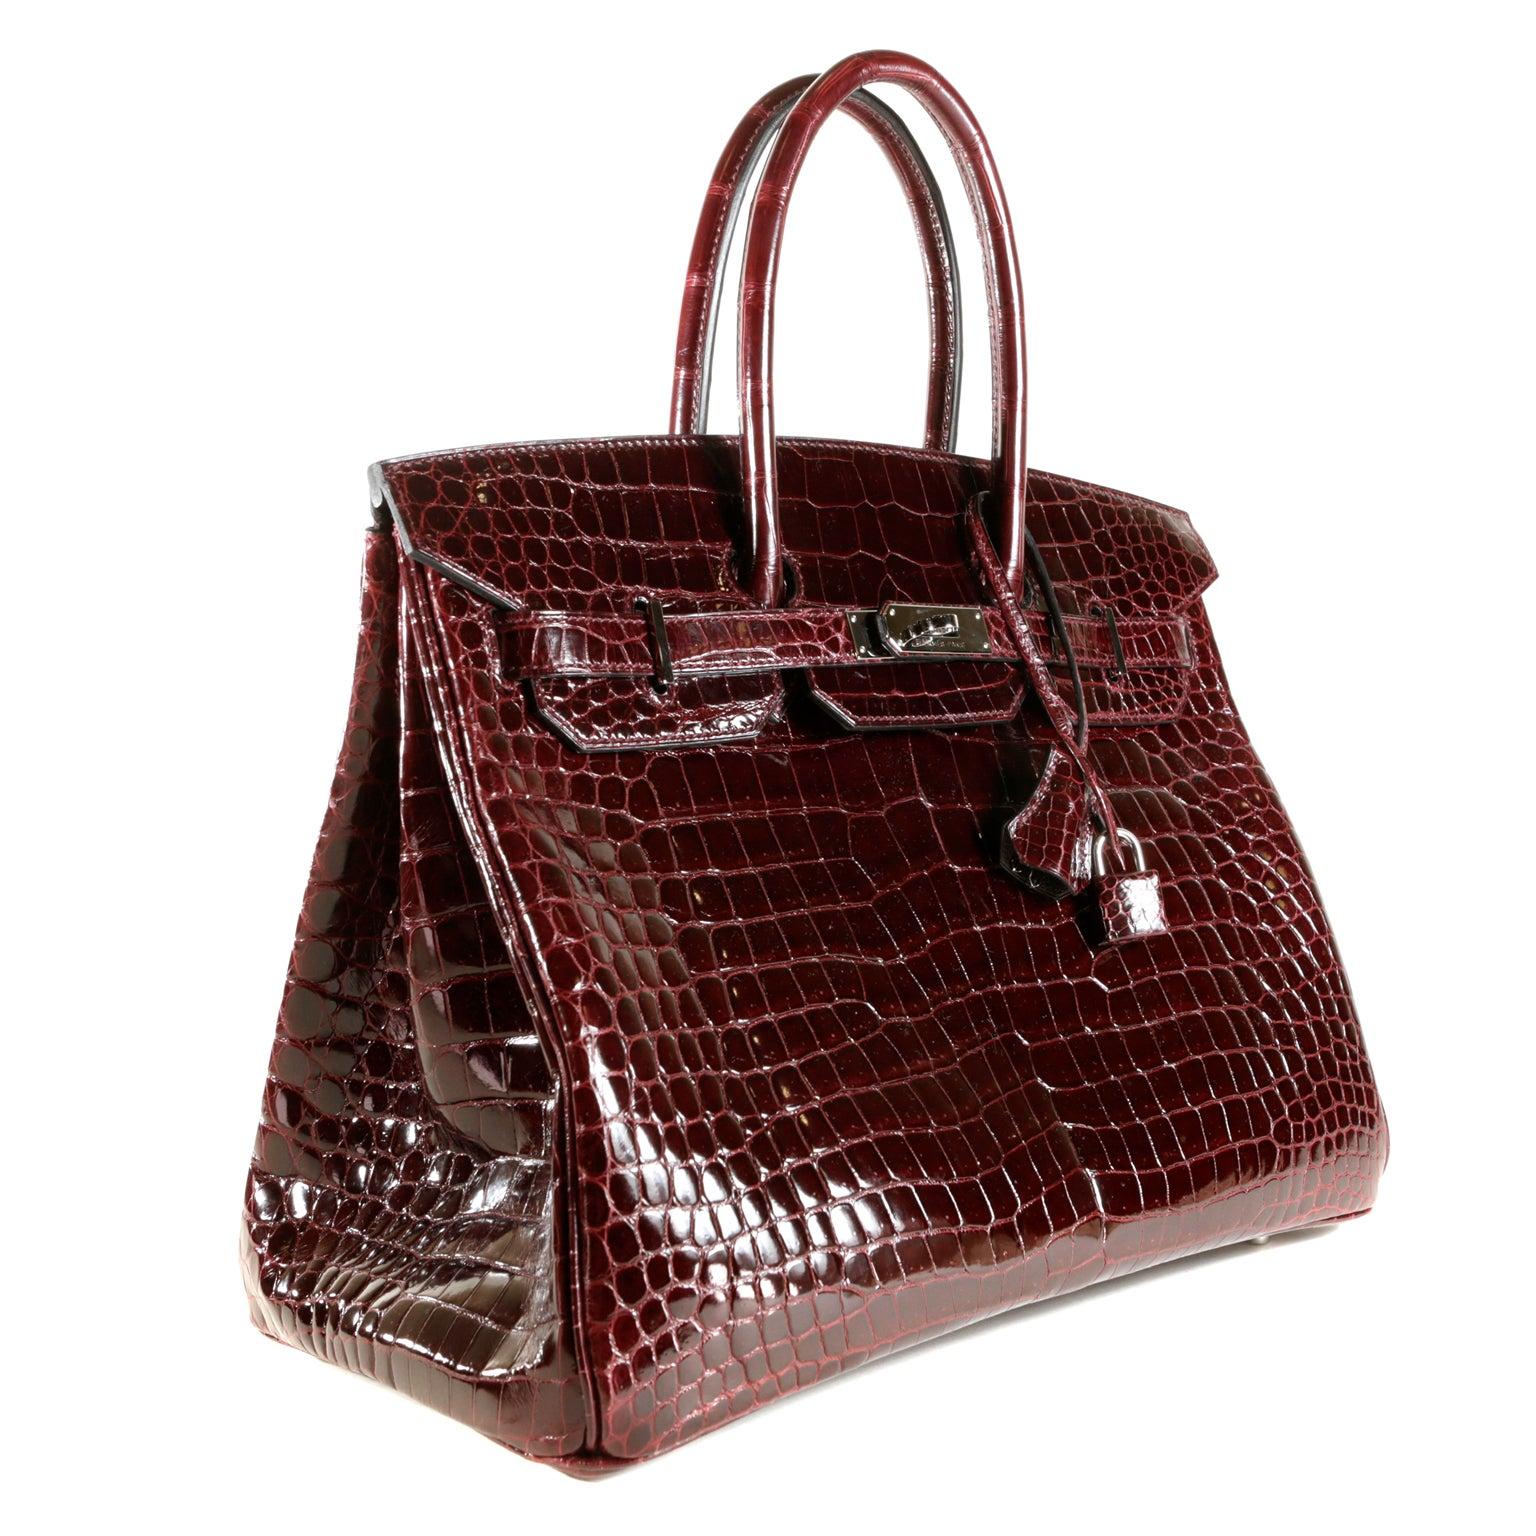 c157cf66e06b Hermès Bordeaux Porosus Crocodile 35 cm Birkin Bag For Sale at 1stdibs